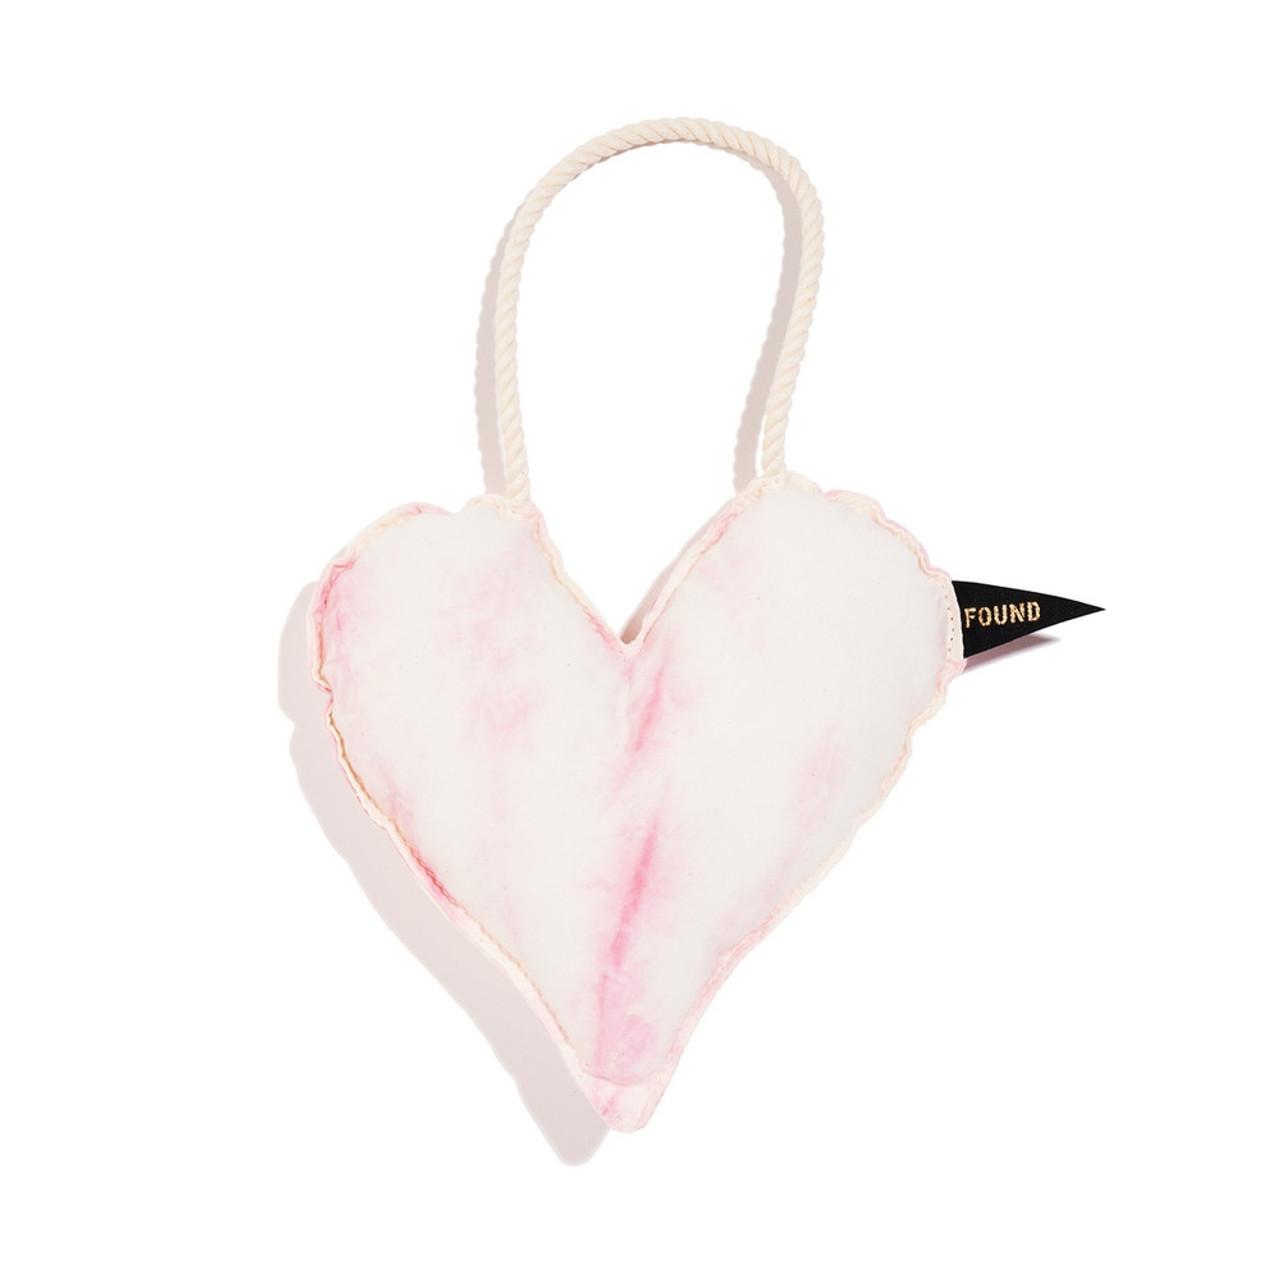 Cotton Heart Dog Toy - Blush, Medium